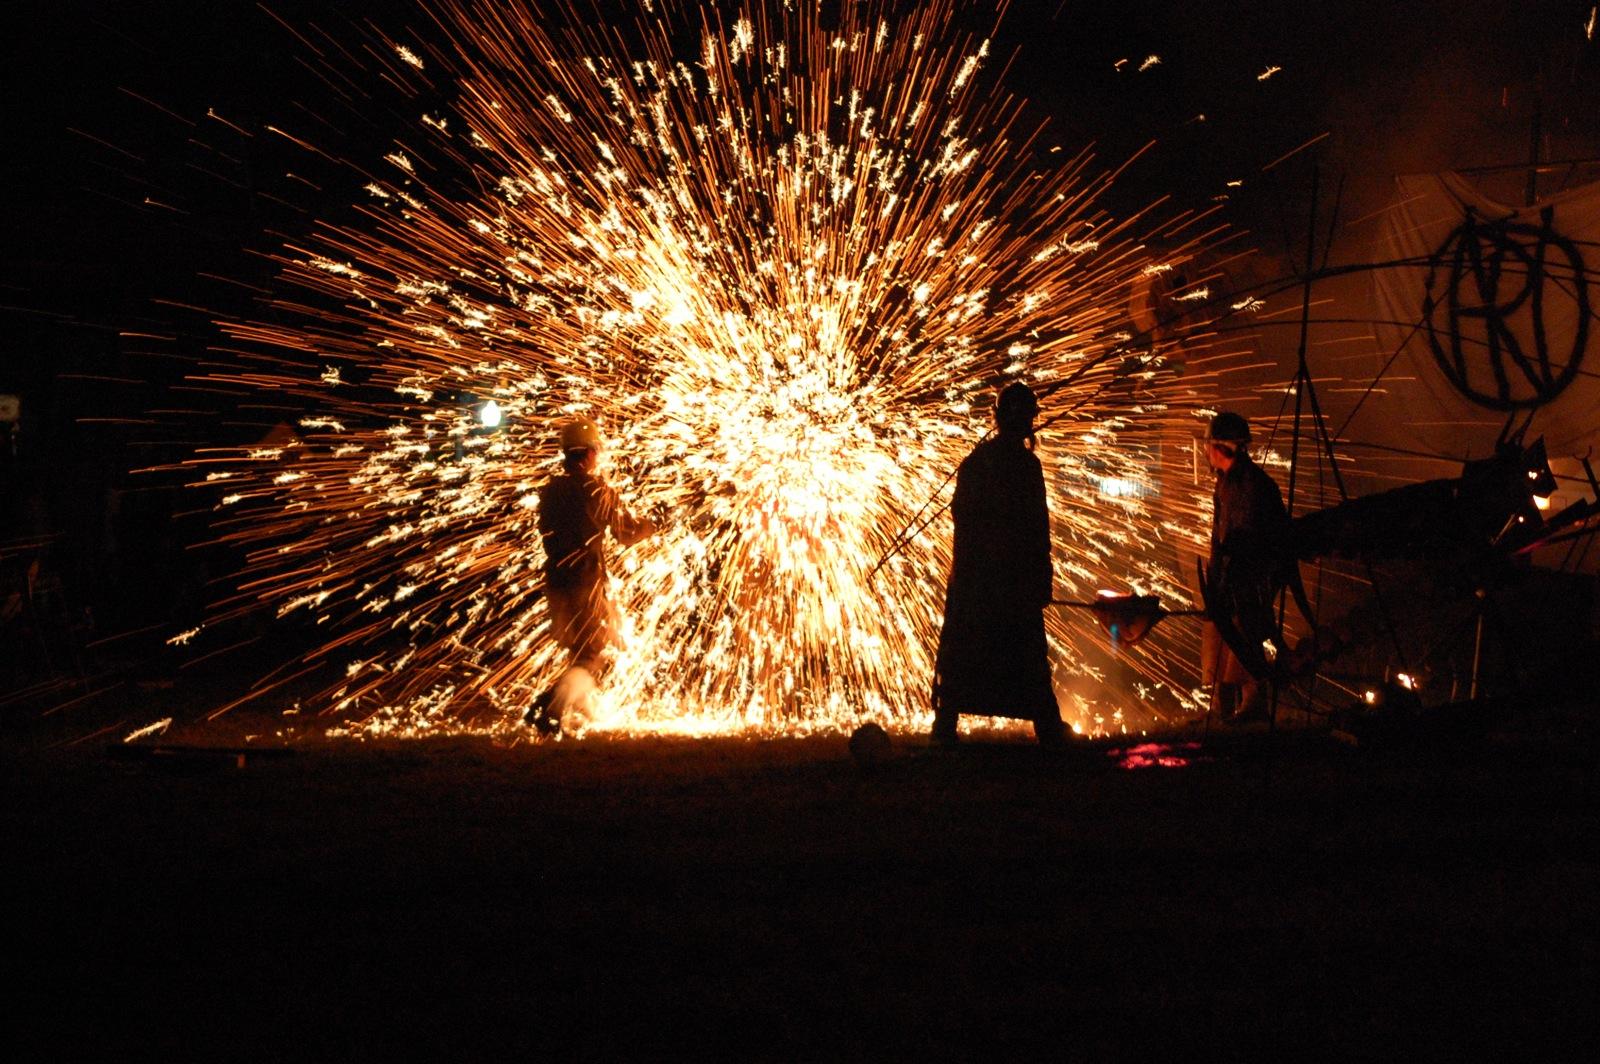 Molten Iron Throwing Pixel Cc Httpflic.Krpdo8c Ll   05